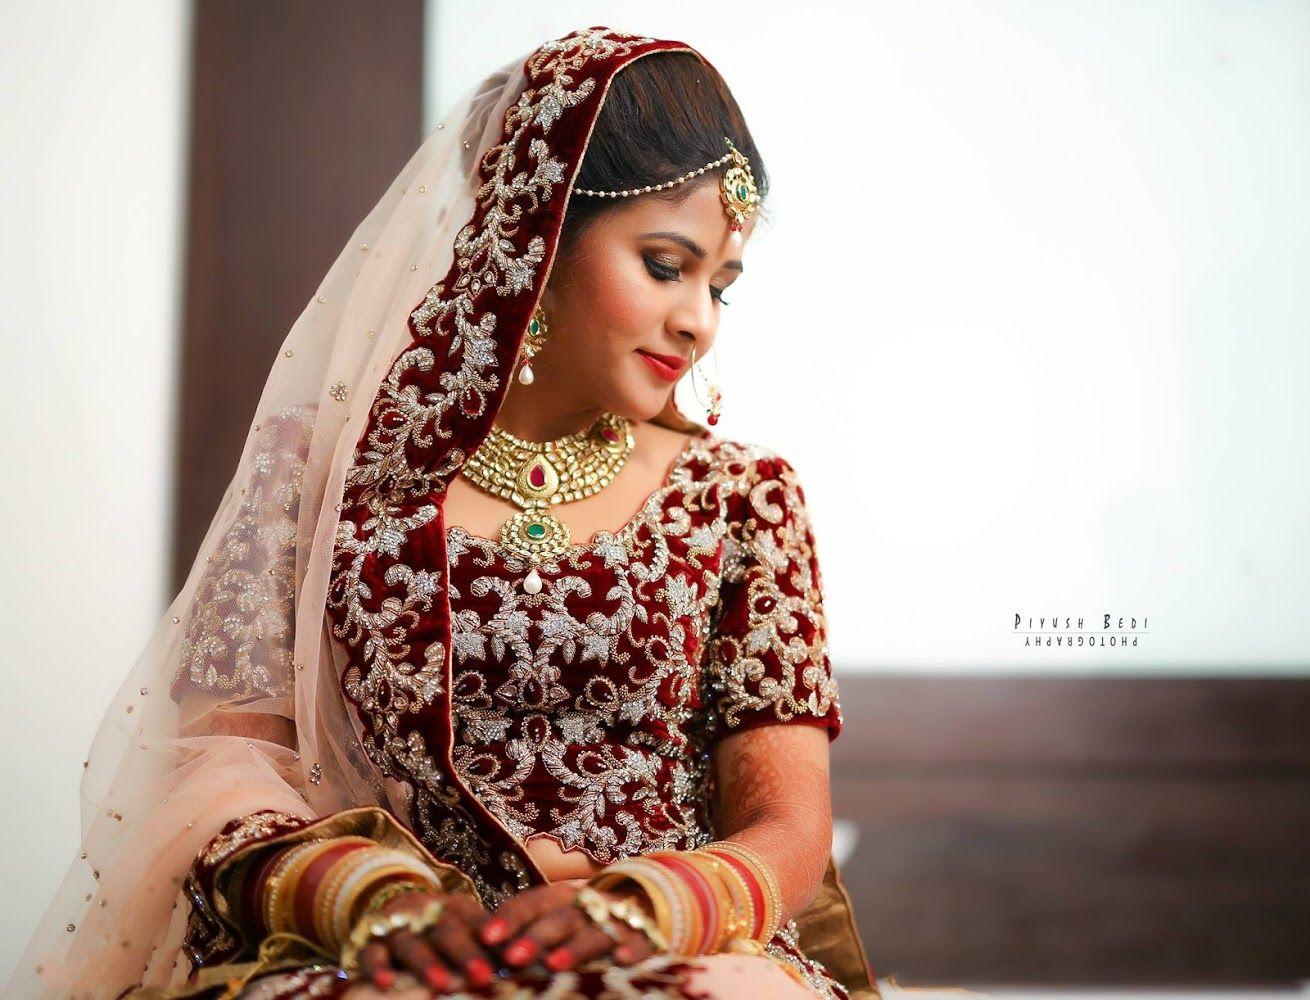 Nice photo by Piyush Bedi Photography, Ludhiana #weddingnet #wedding #india #indian #indianwedding #weddingdresses #mehendi #ceremony #realwedding #lehenga #lehengacholi #choli #lehengawedding #lehengasaree #saree #bridalsaree #weddingsaree #indianweddingoutfits #outfits #backdrops #groom #wear #groomwear #sherwani #groomsmen #bridesmaids #prewedding #photoshoot #photoset #details #sweet #cute #gorgeous #fabulous #jewels #rings #tikka #earrings #sets #lehnga